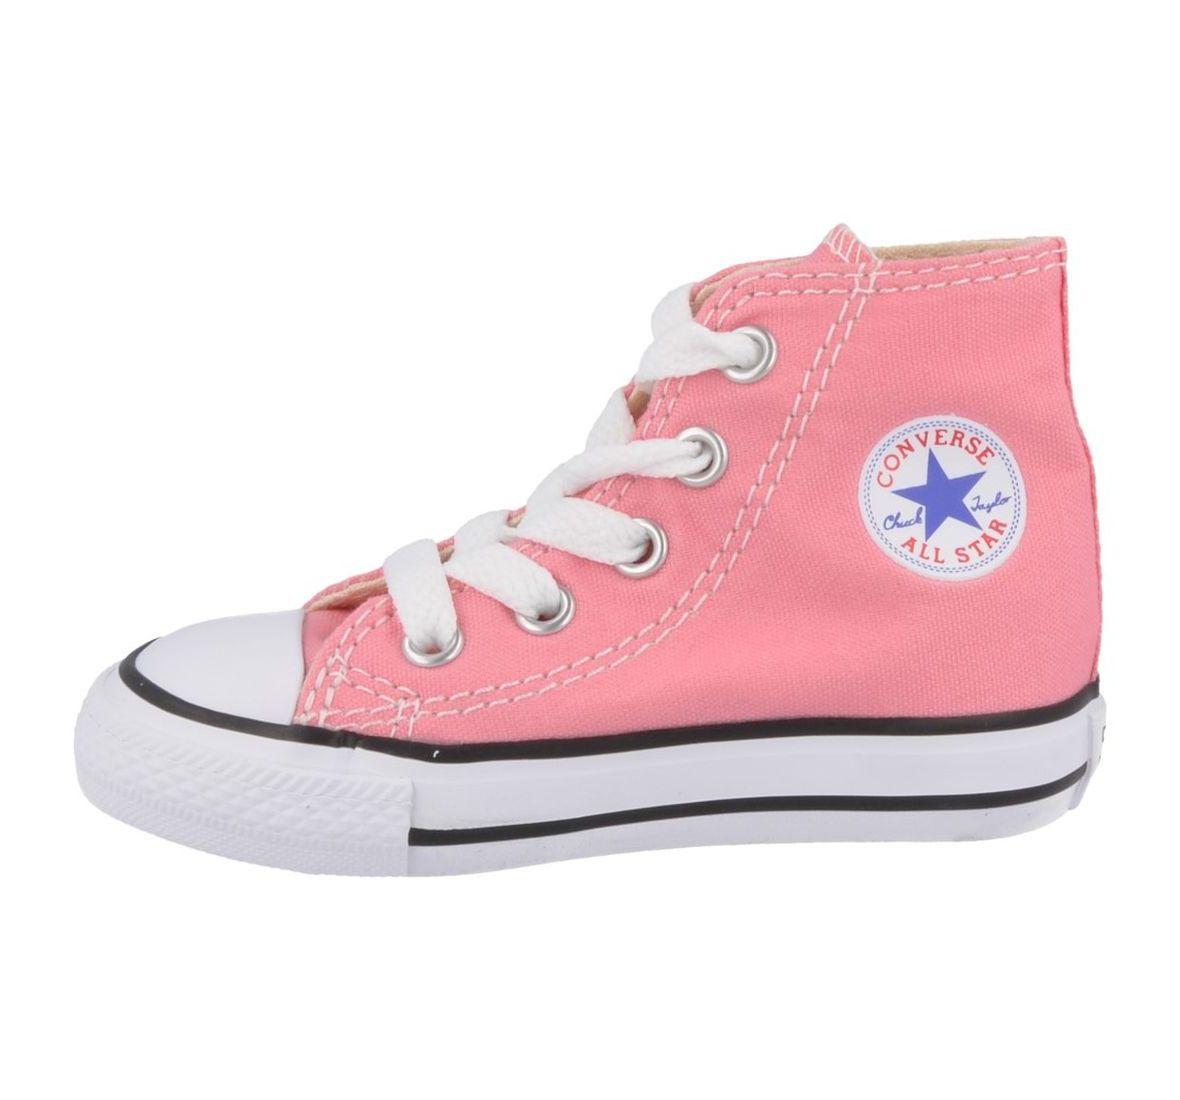 927e7877333b Converse Chuck Taylor All Star 351171C Gyerek Utcai Cipő   Utcai cipő